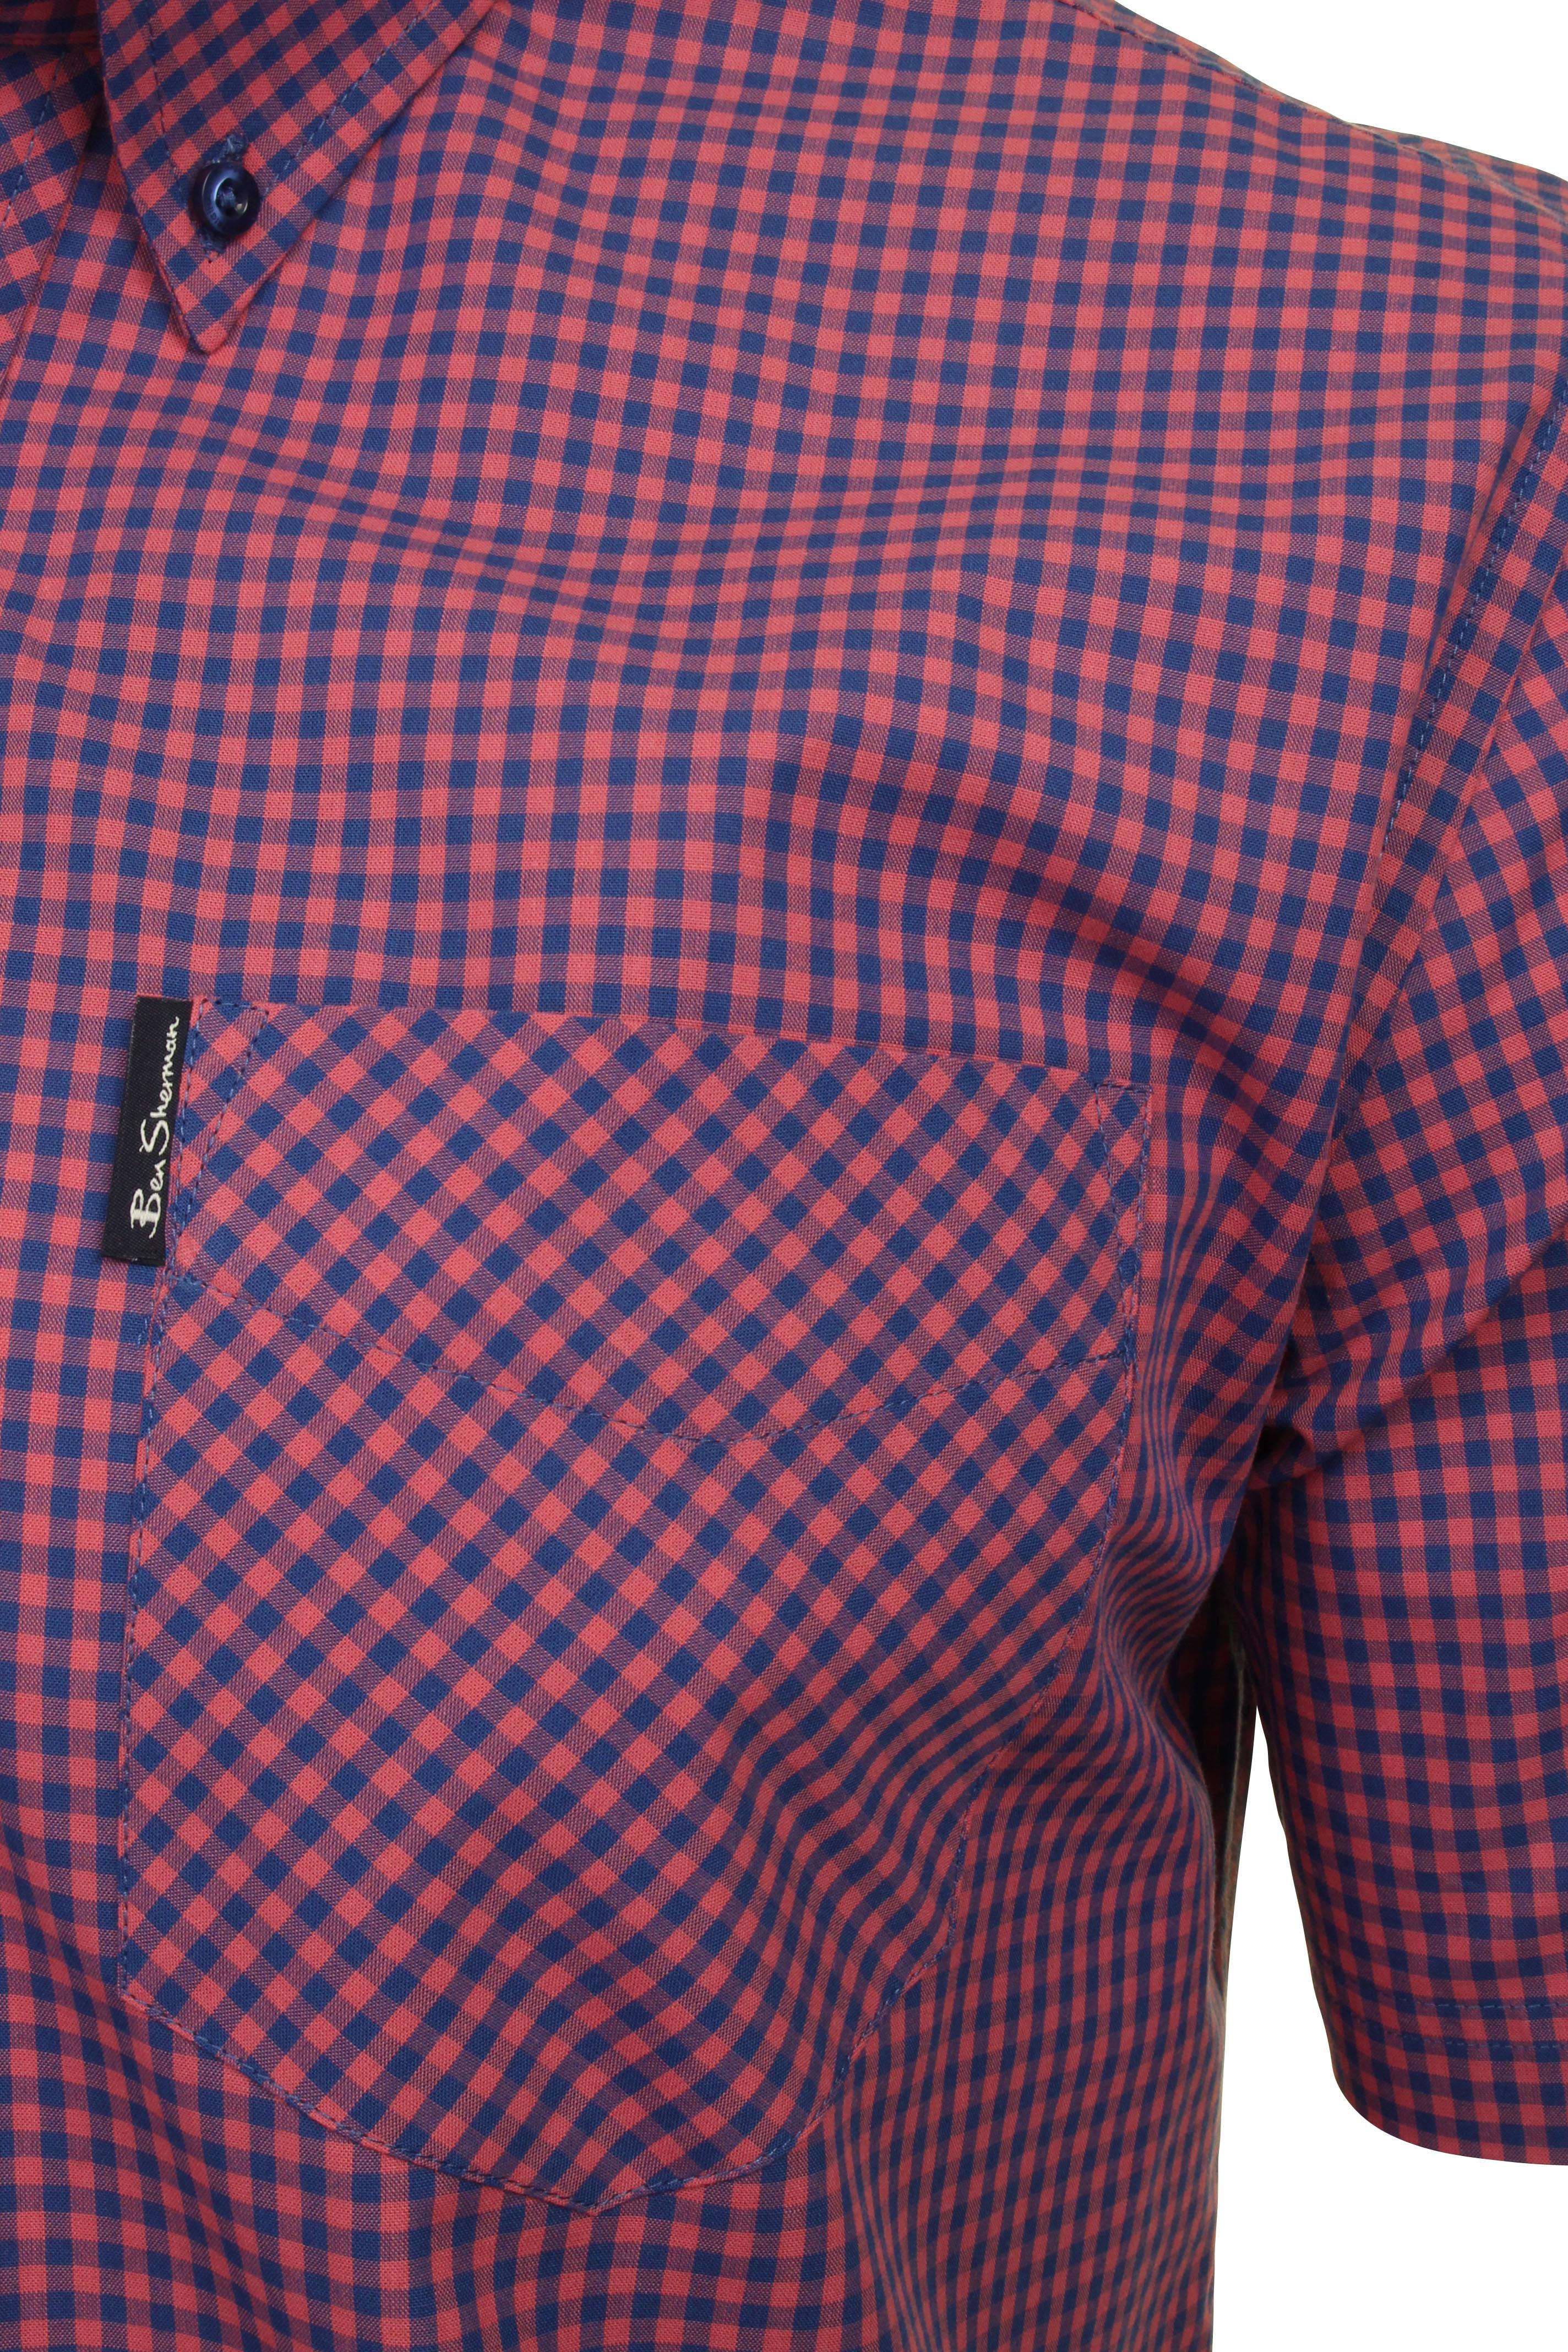 Ben-Sherman-Mens-Short-Sleeved-Gingham-Check-Shirt thumbnail 7